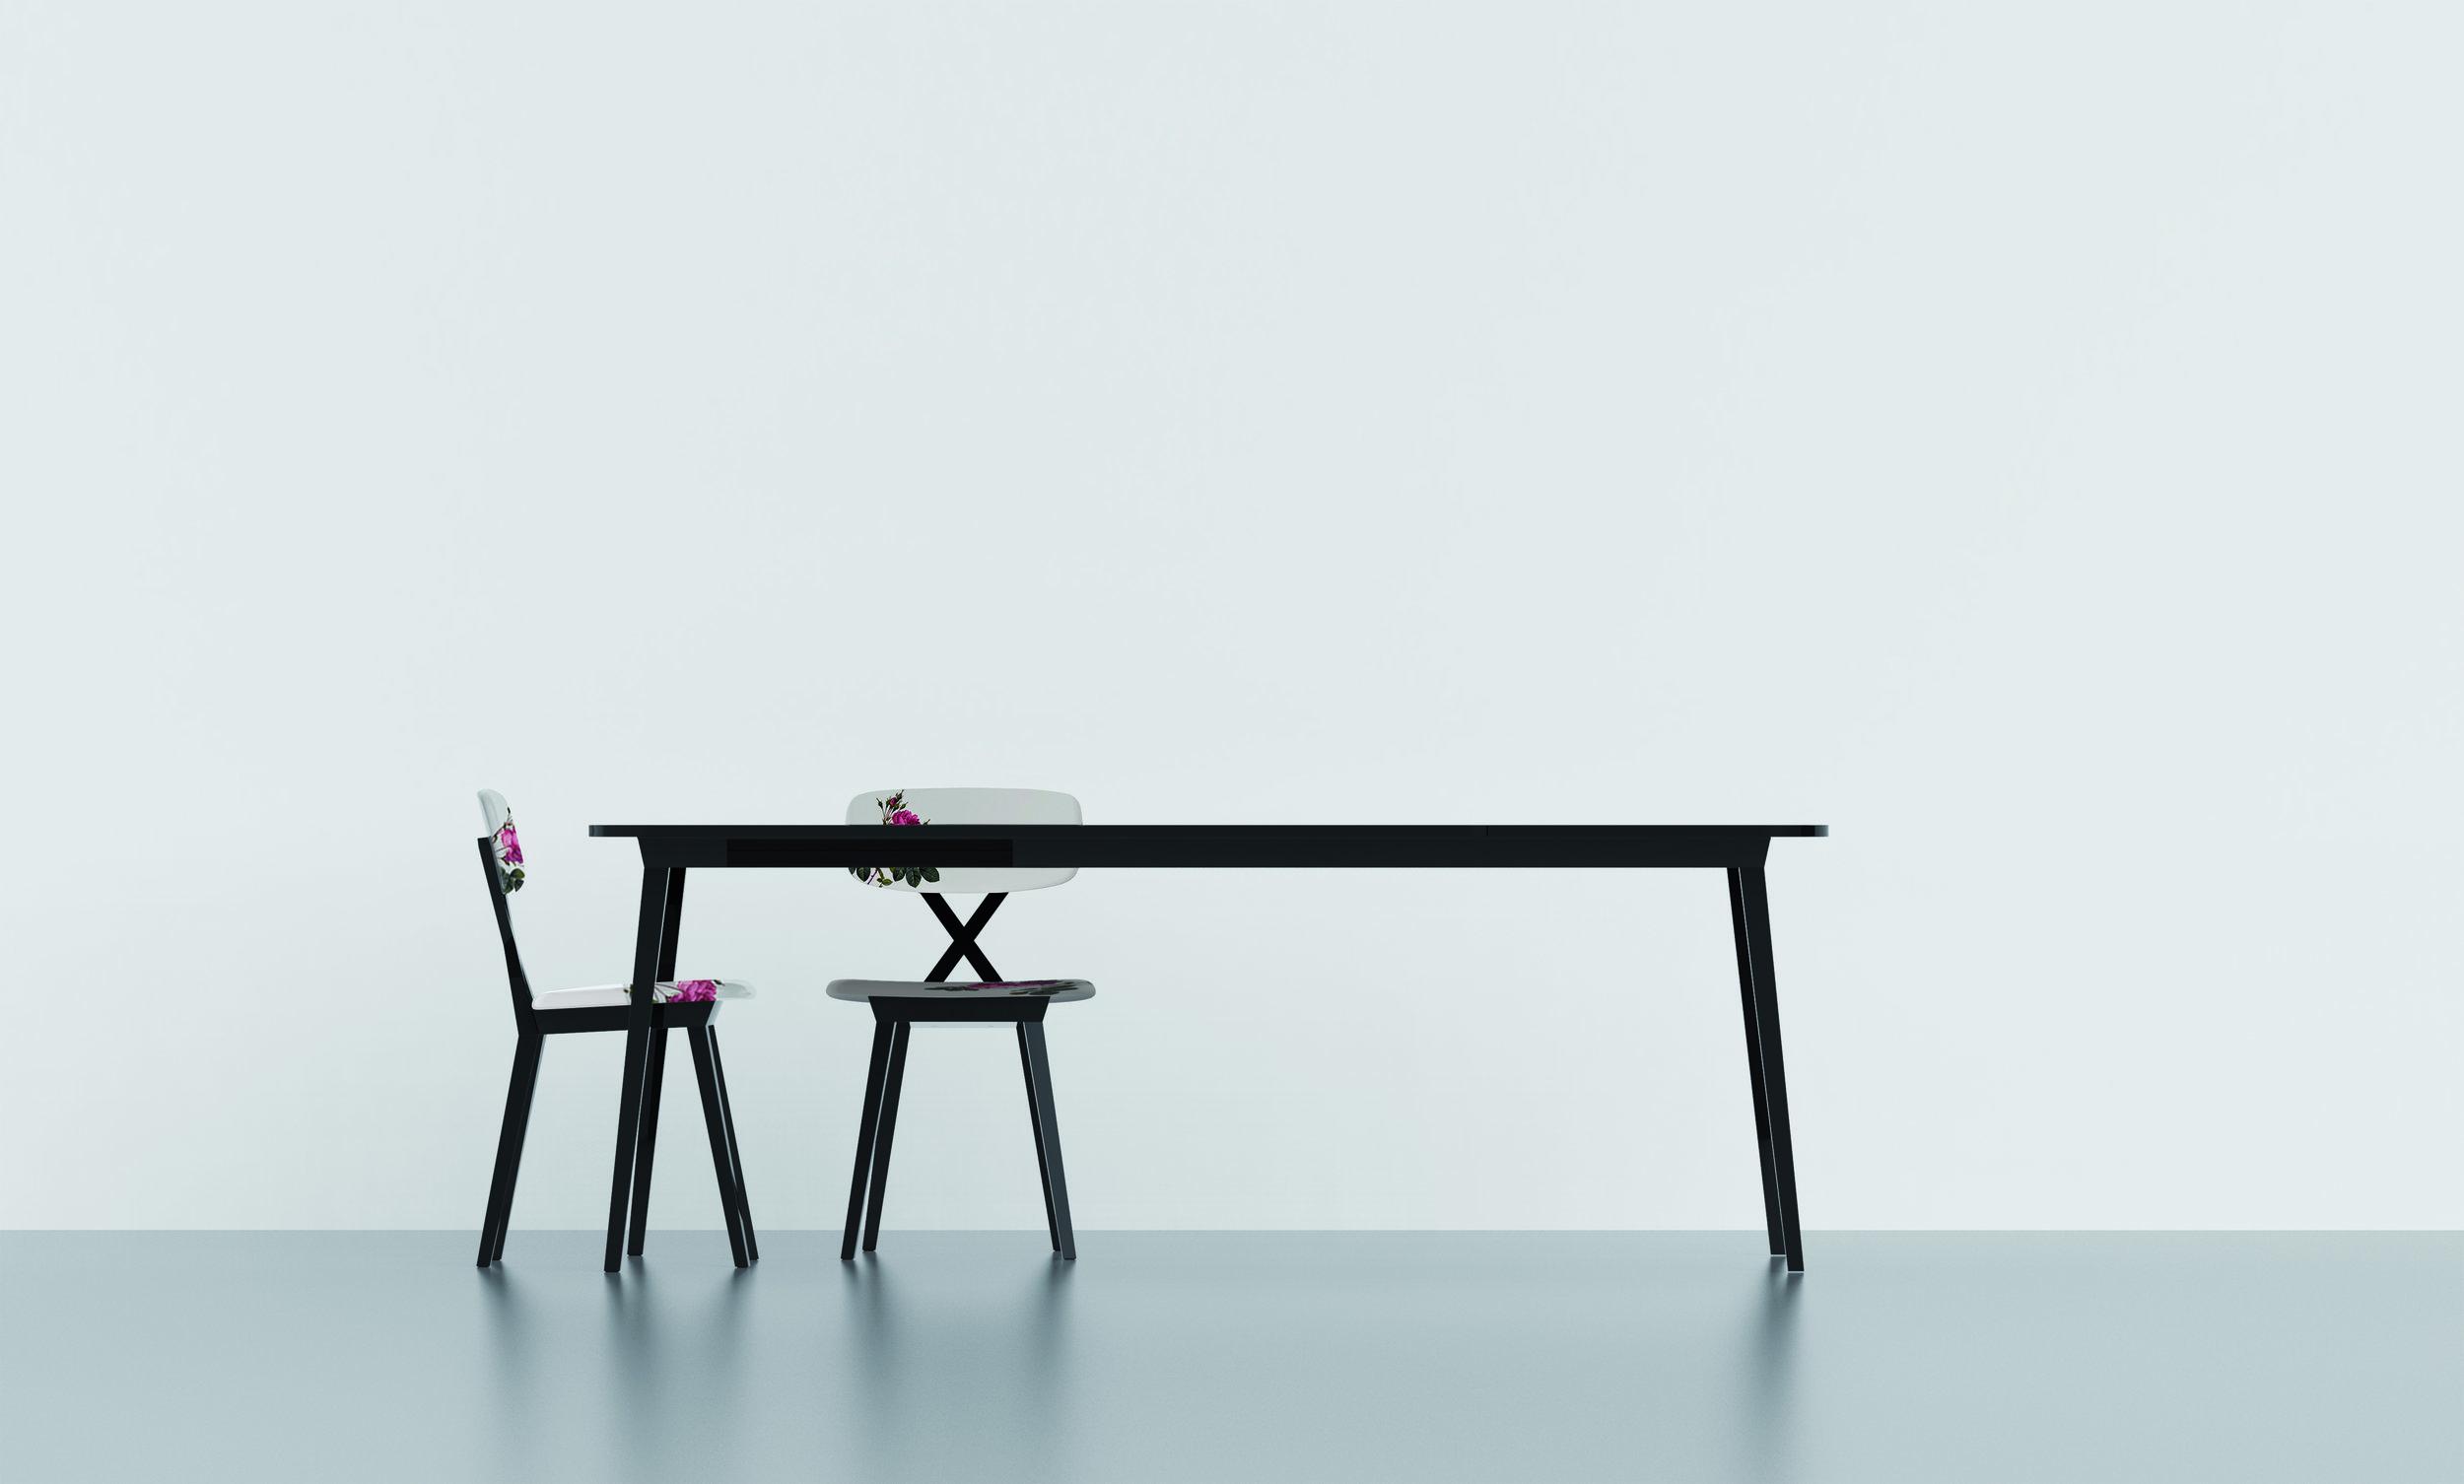 51-qeeboo-x-chair-with-cushion-flower-by-nika-zupanc.jpg